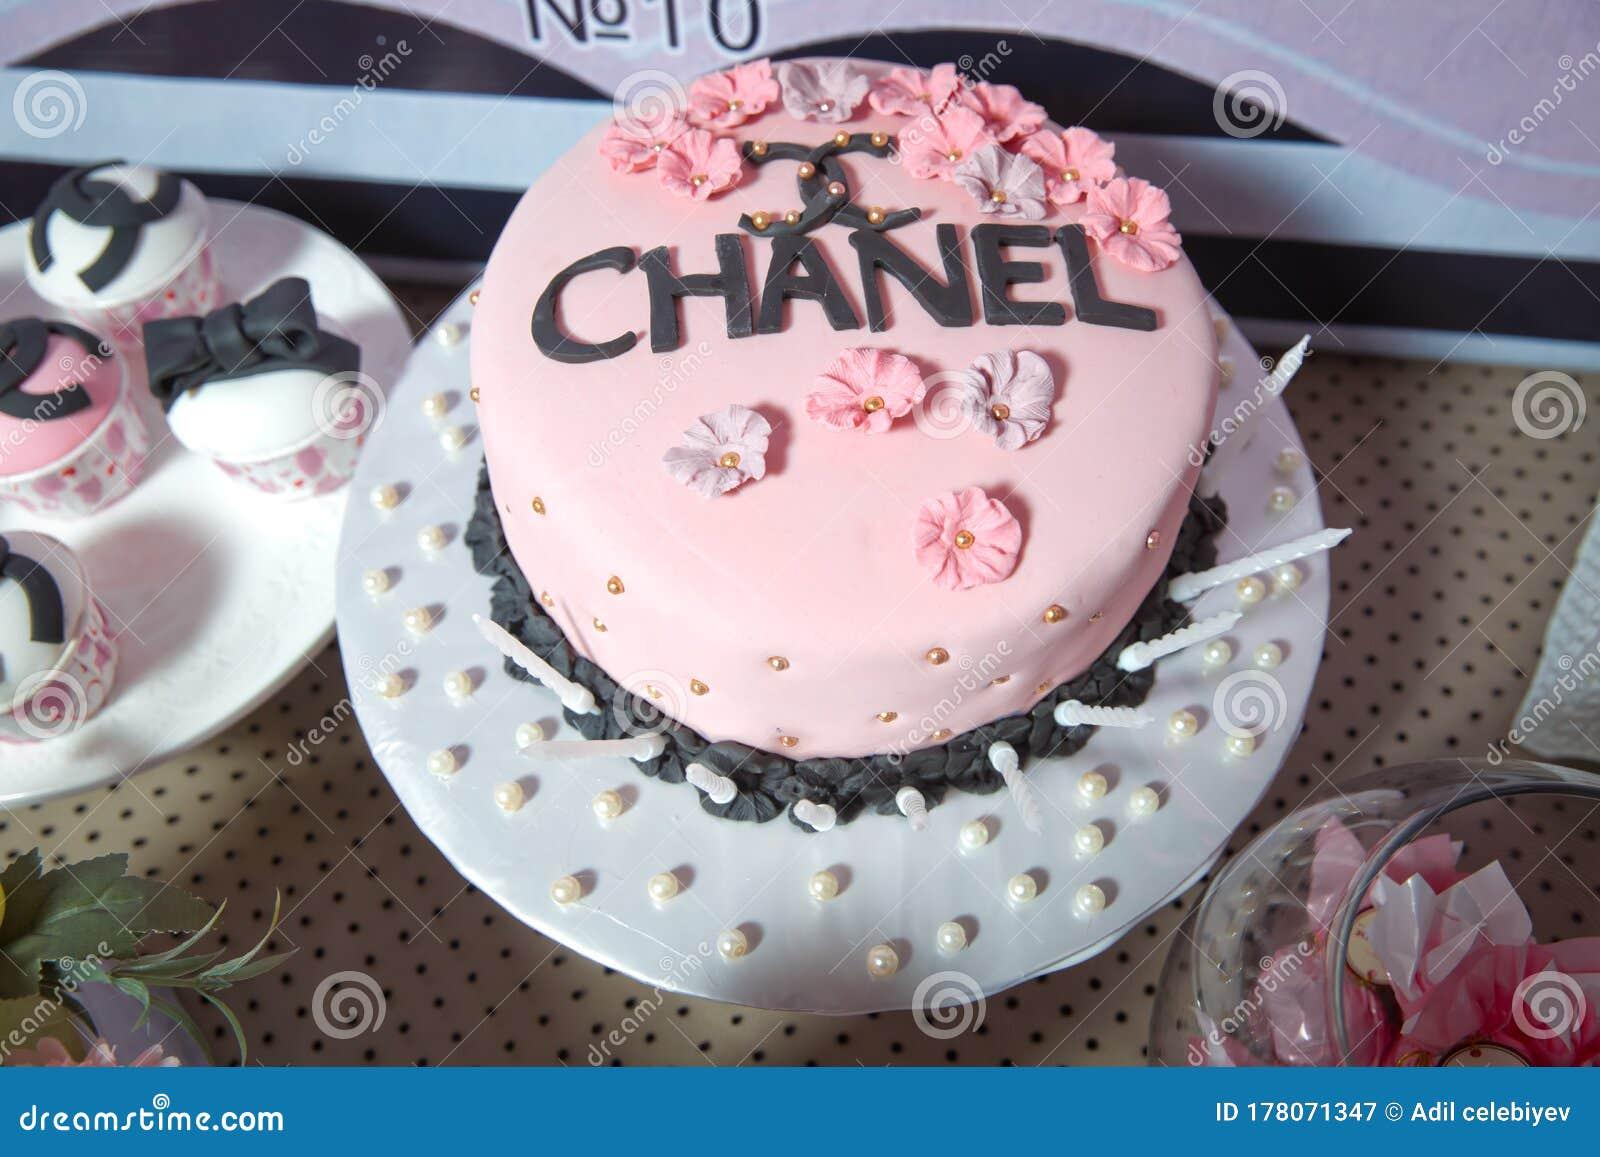 Remarkable Chanel Theme Customized Cake Chanel Cake Smash Candy Bar Funny Birthday Cards Online Benoljebrpdamsfinfo